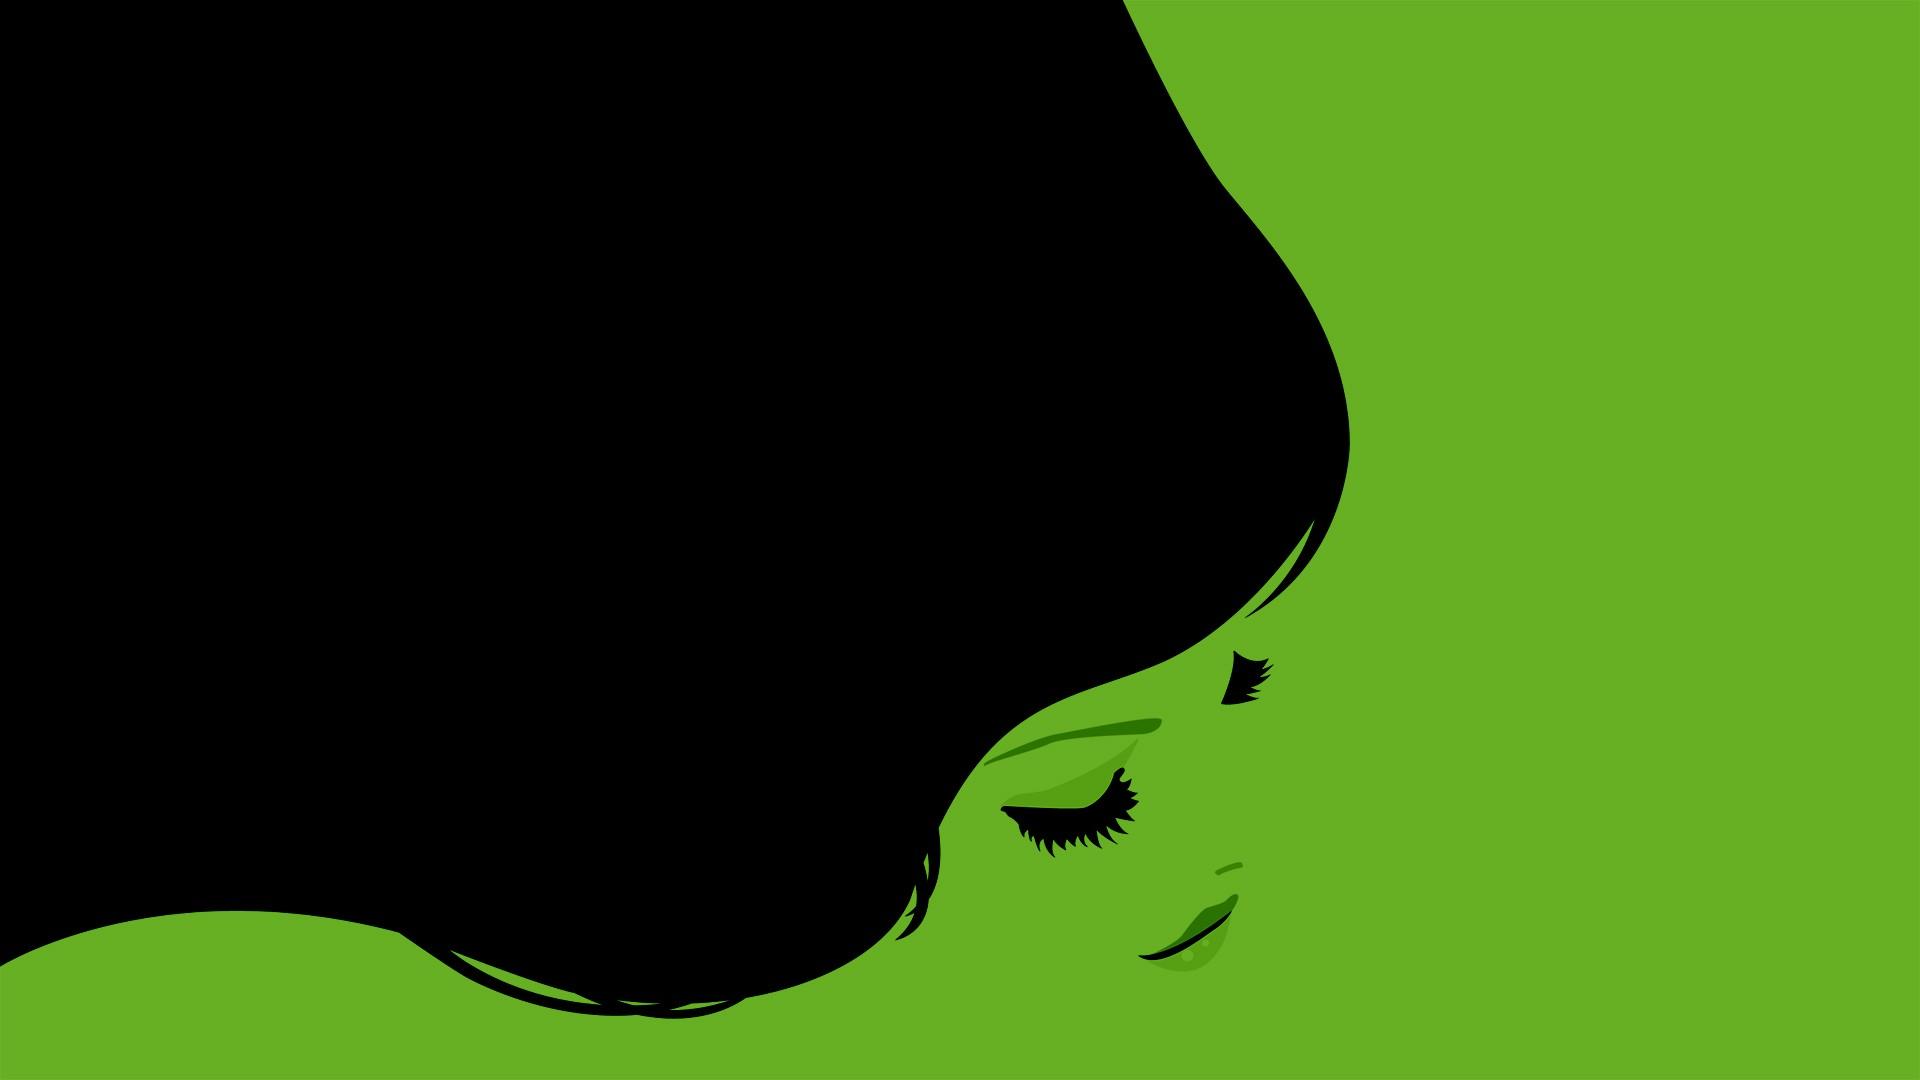 3d Graphic Wallpaper 1280x1024 Minimalism Simple Background Green Background Dark Hair